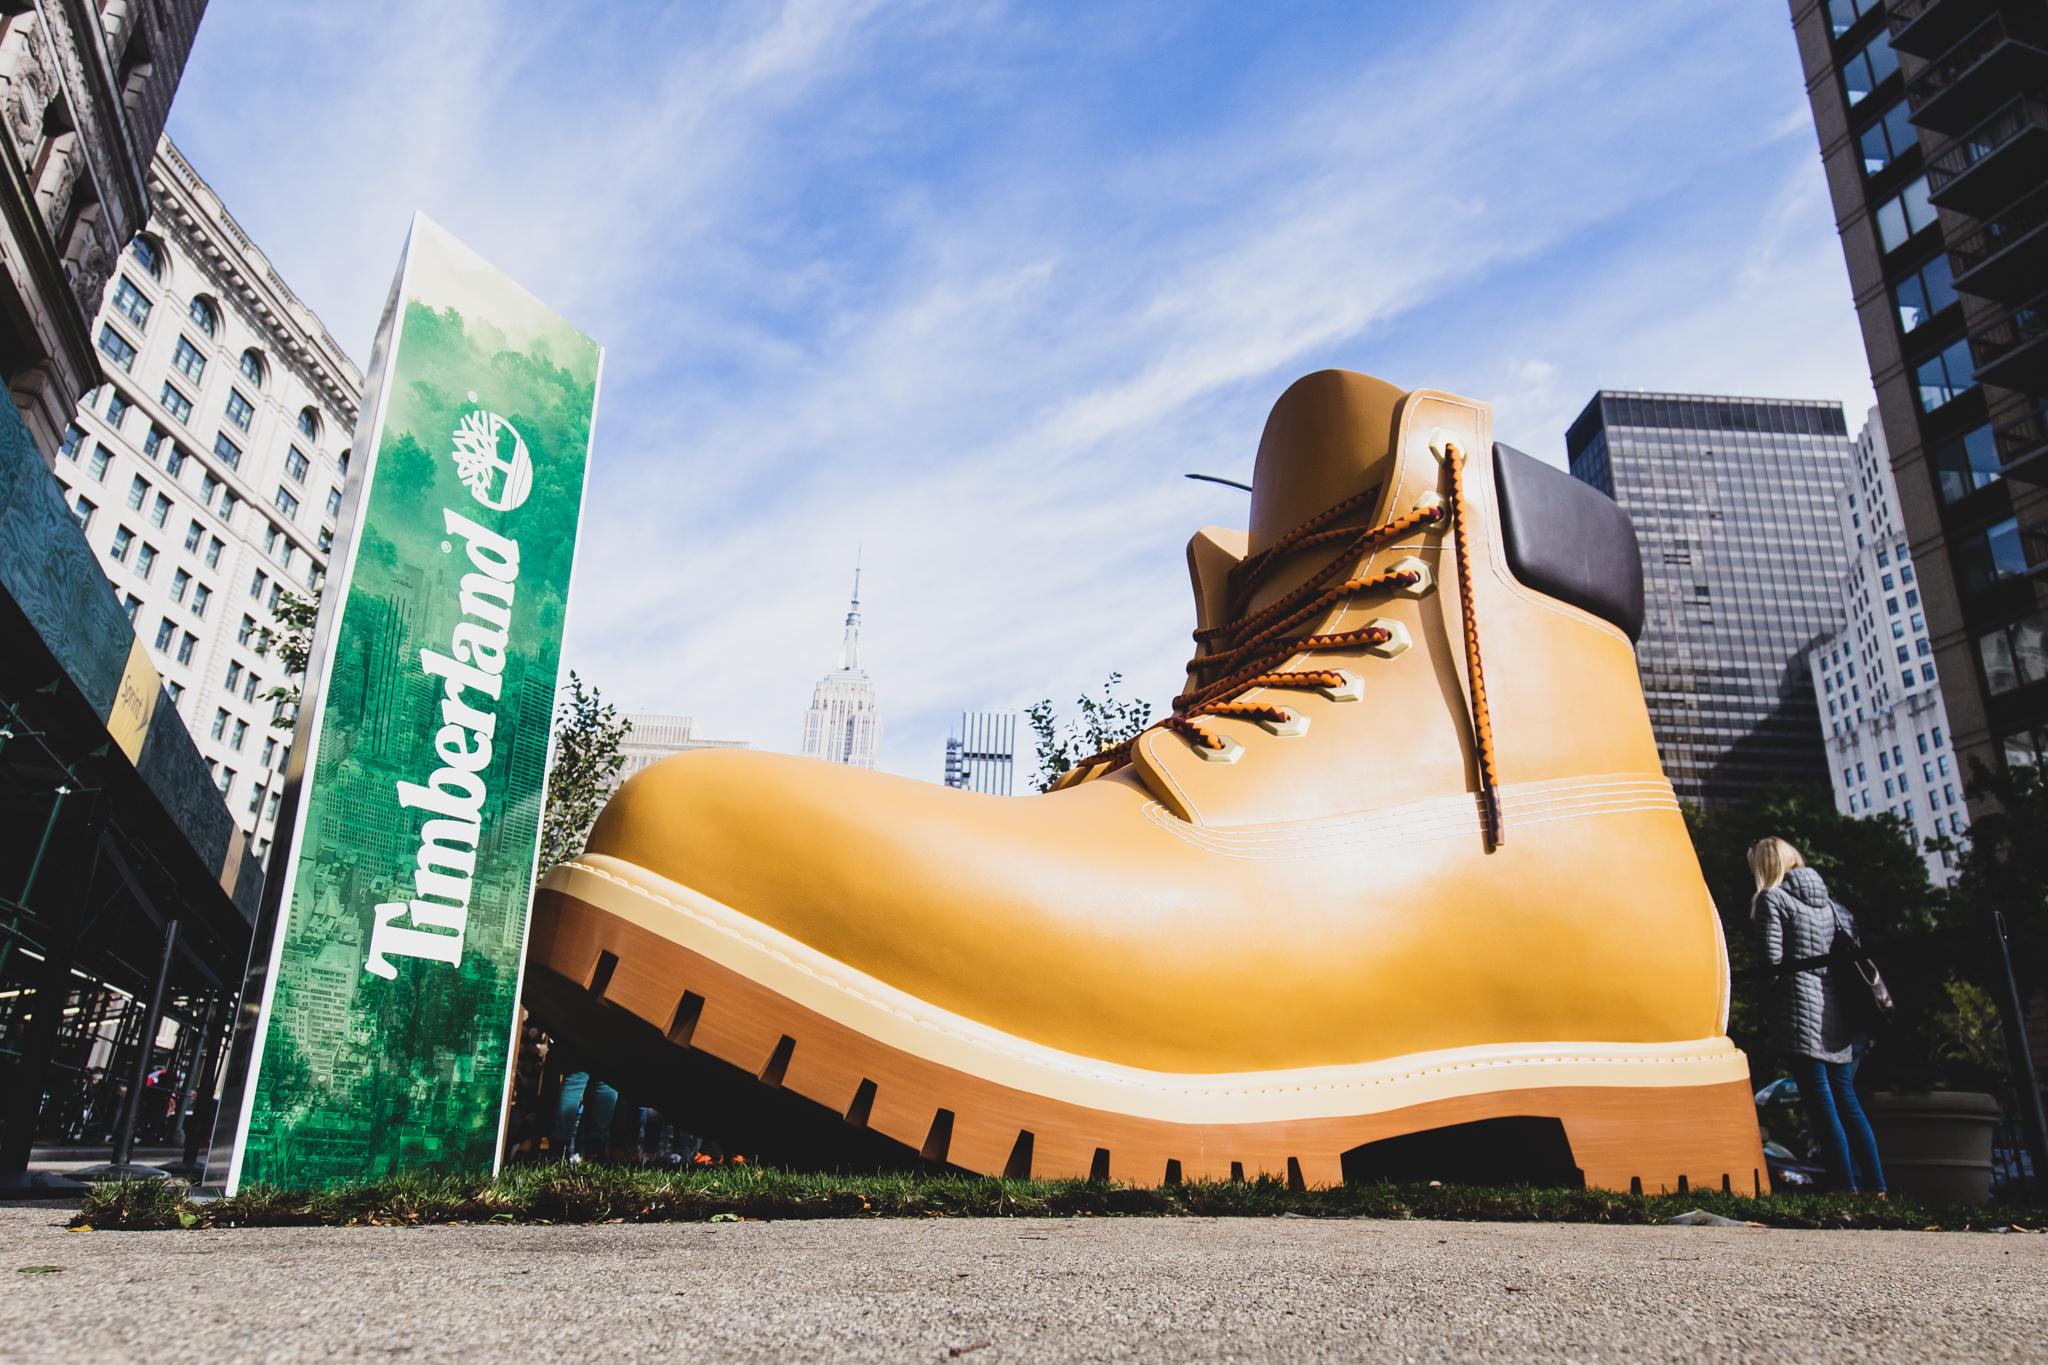 TIMBERLAND: GREEN INITIATIVE, POP UP PARK